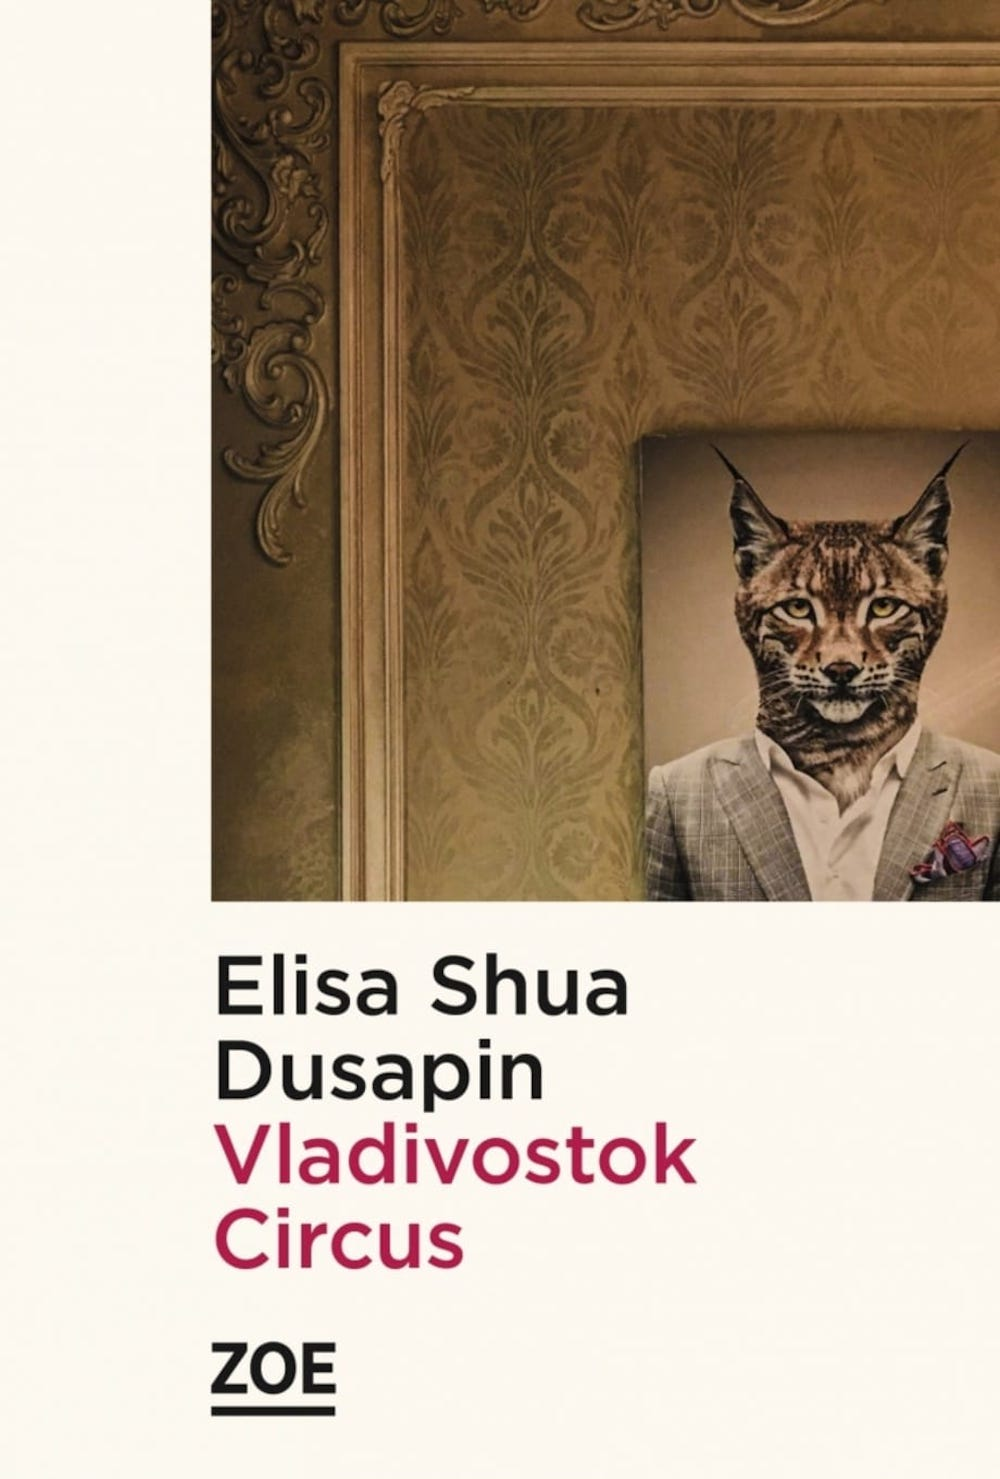 Vladivostock Circus d'Elisa Shua Dusapin image couverture livre 2020